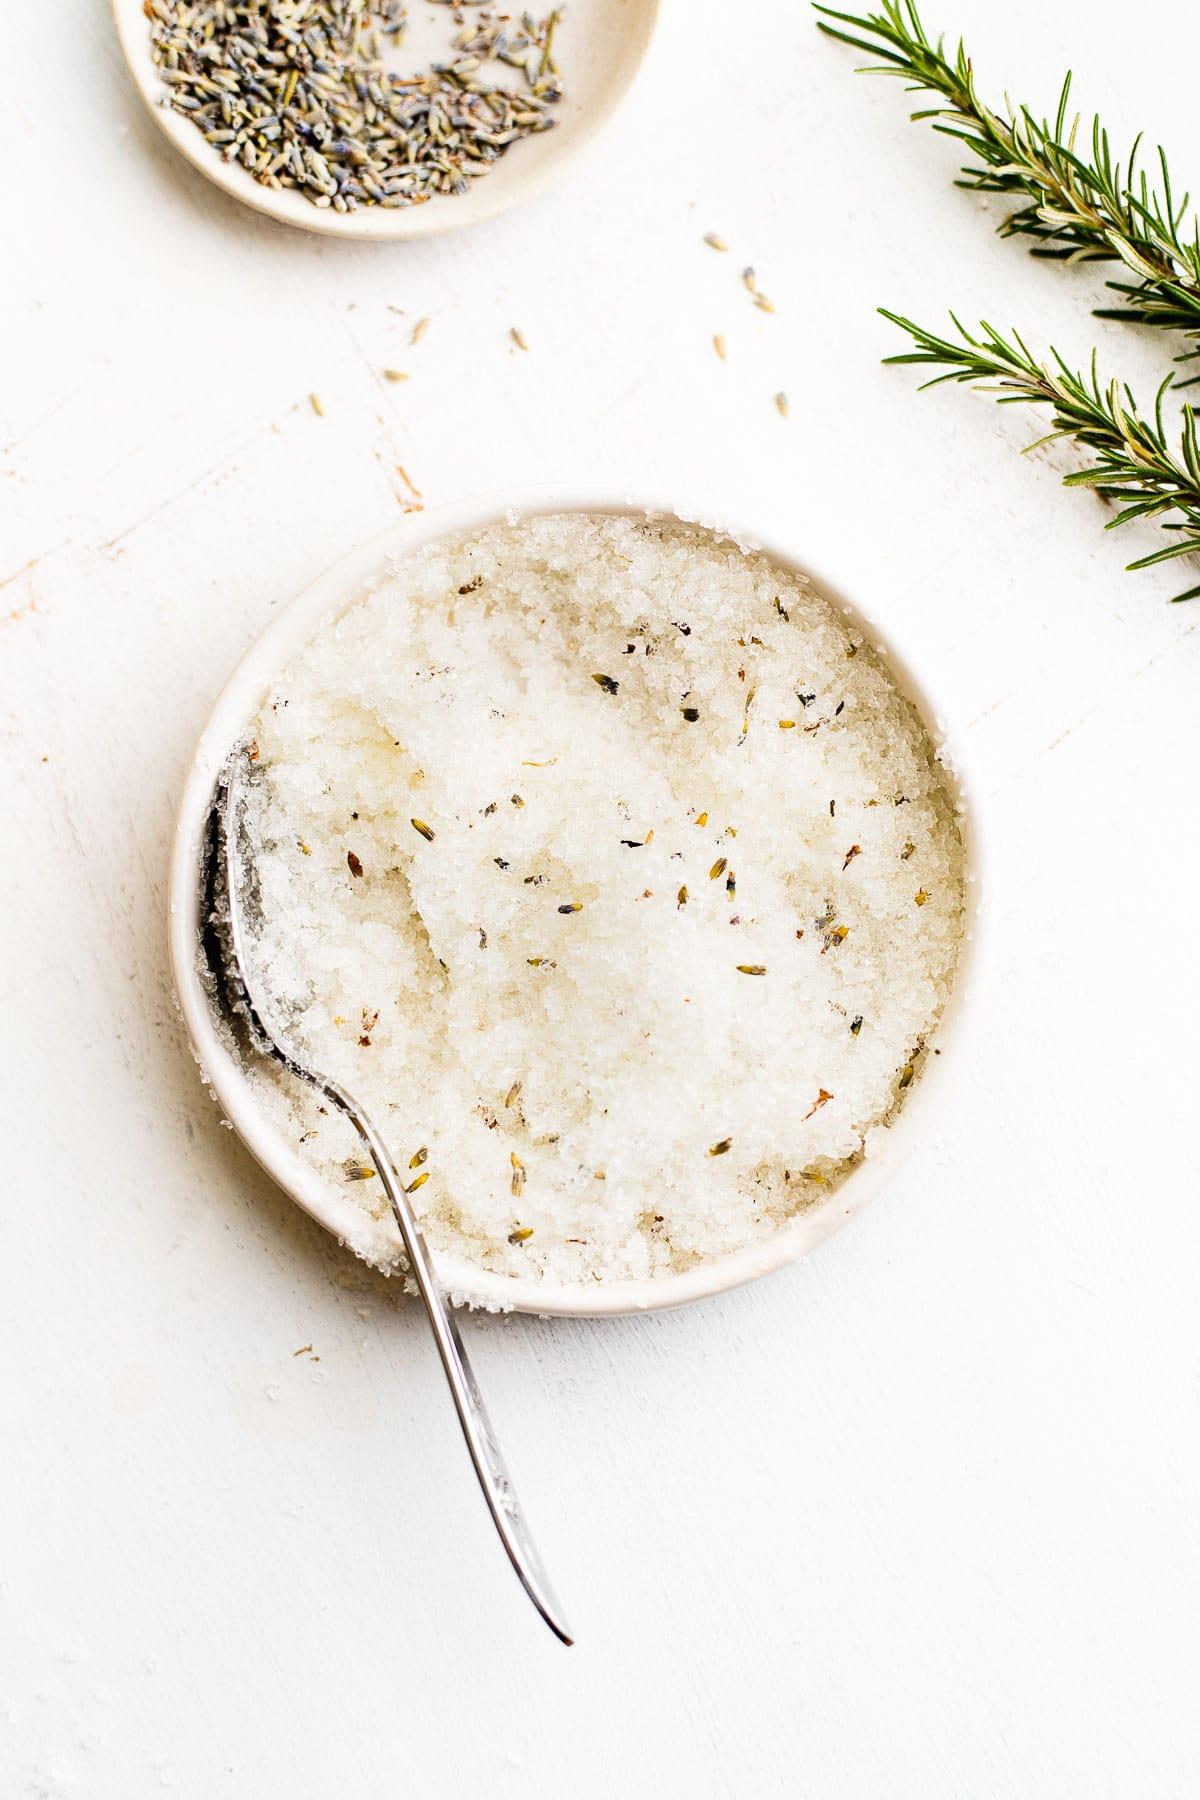 bath salt for endometriosis